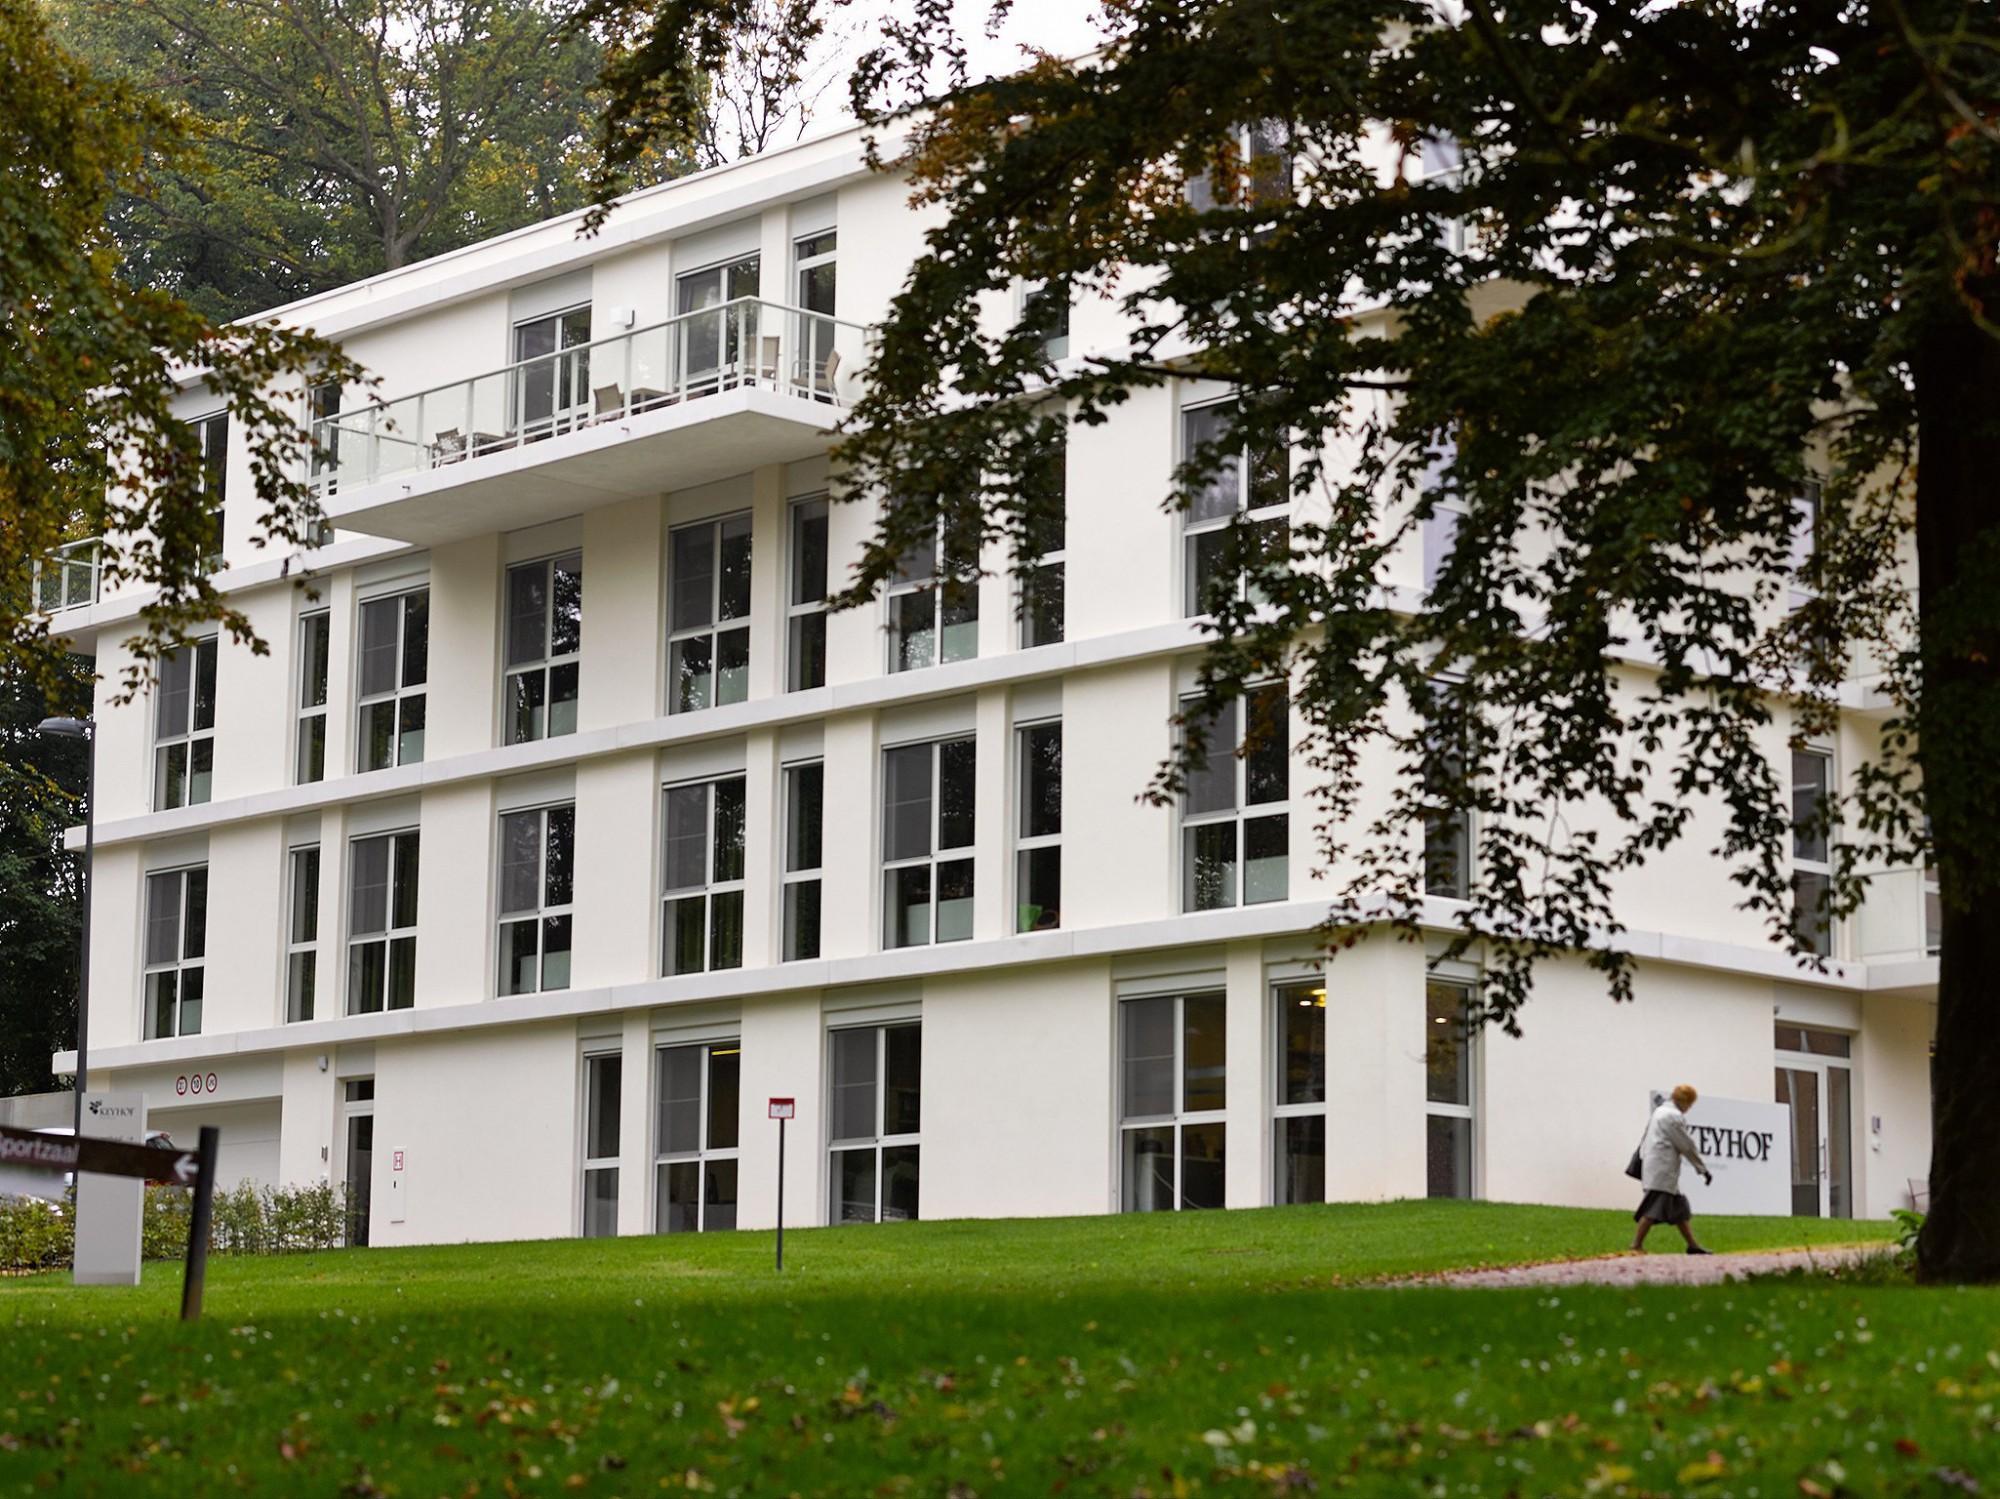 Afbeelding: Architectuur fotografie, woon-en zorgcentrum te Huldenberg, voor groep Van Roey.